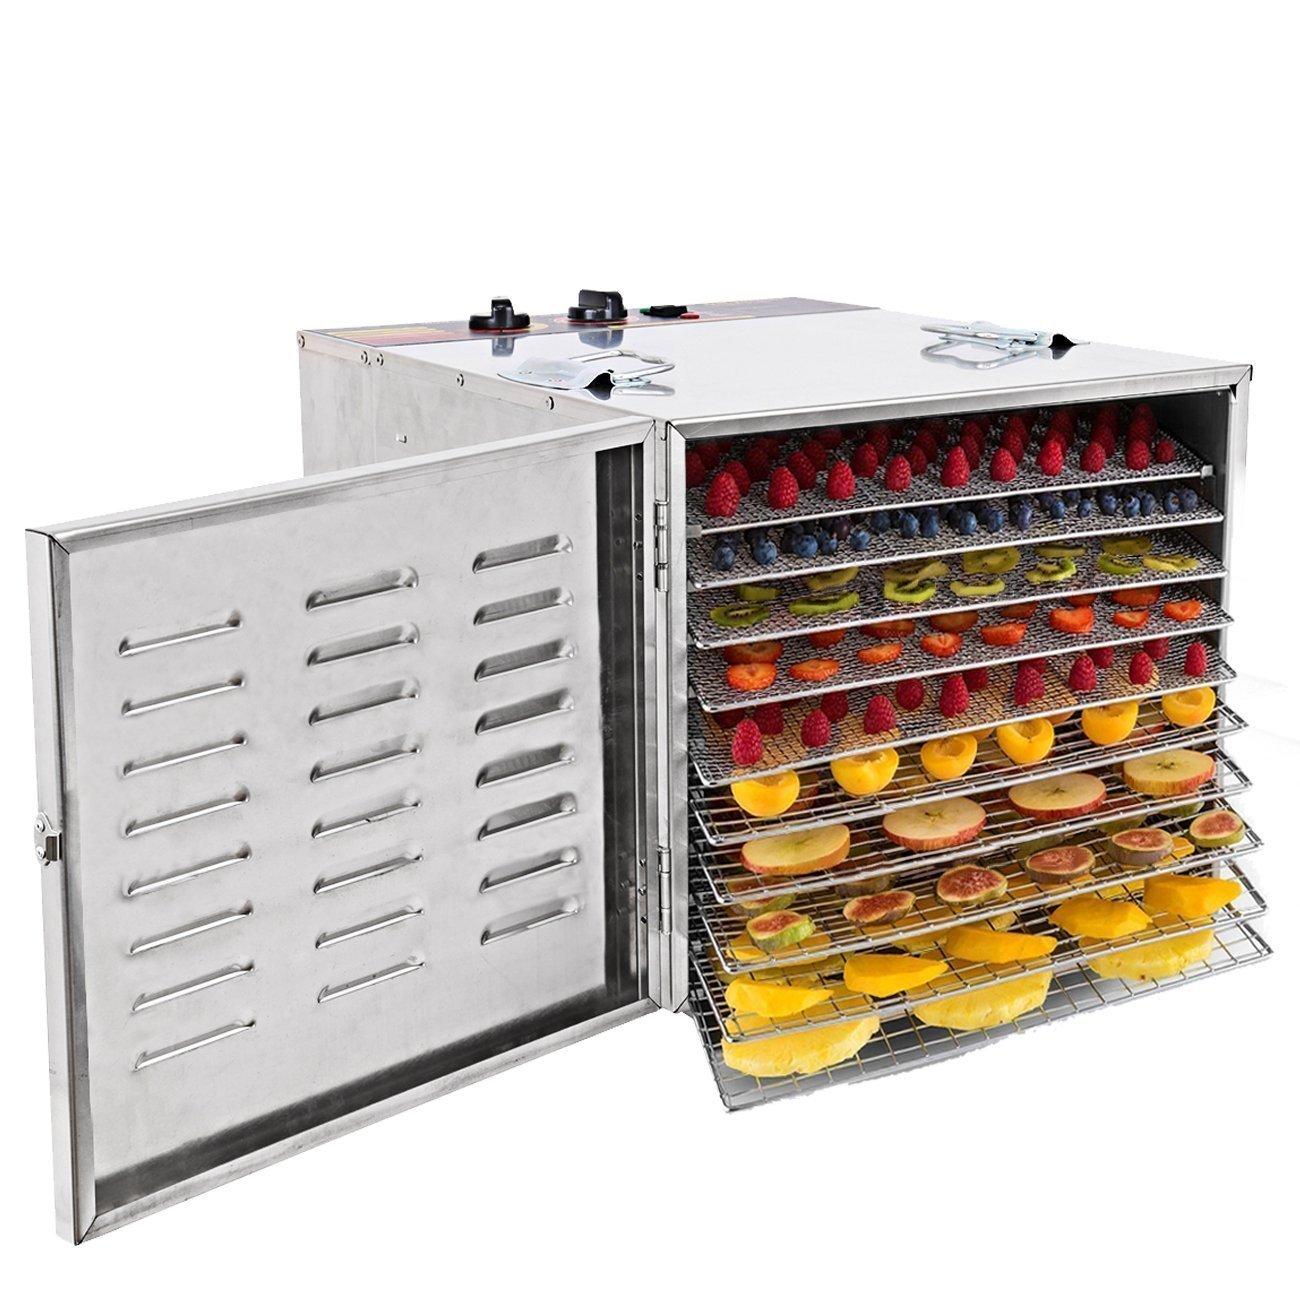 Ridgeyard 1000W Dehydrator Commercial Grade Stainless Steel Digital Food Dehydrator Jerky Dryer 10 Trays 158 Degree Fahrenheit with 15 Hour Timer by Ridgeyard (Image #1)